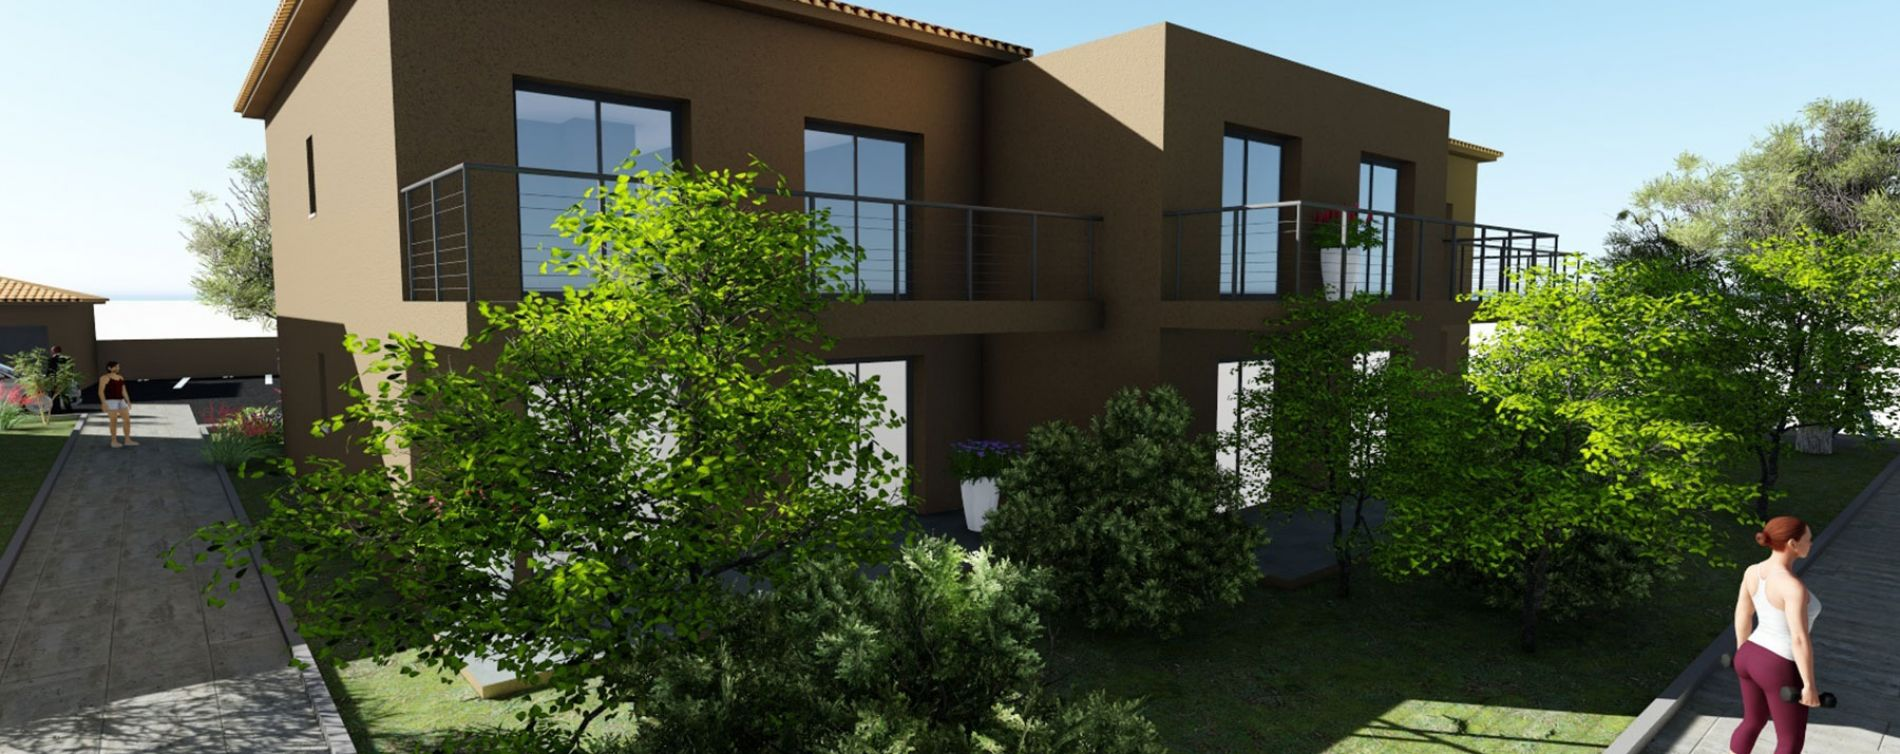 Cervione : programme immobilier neuve « Montecristo » (2)